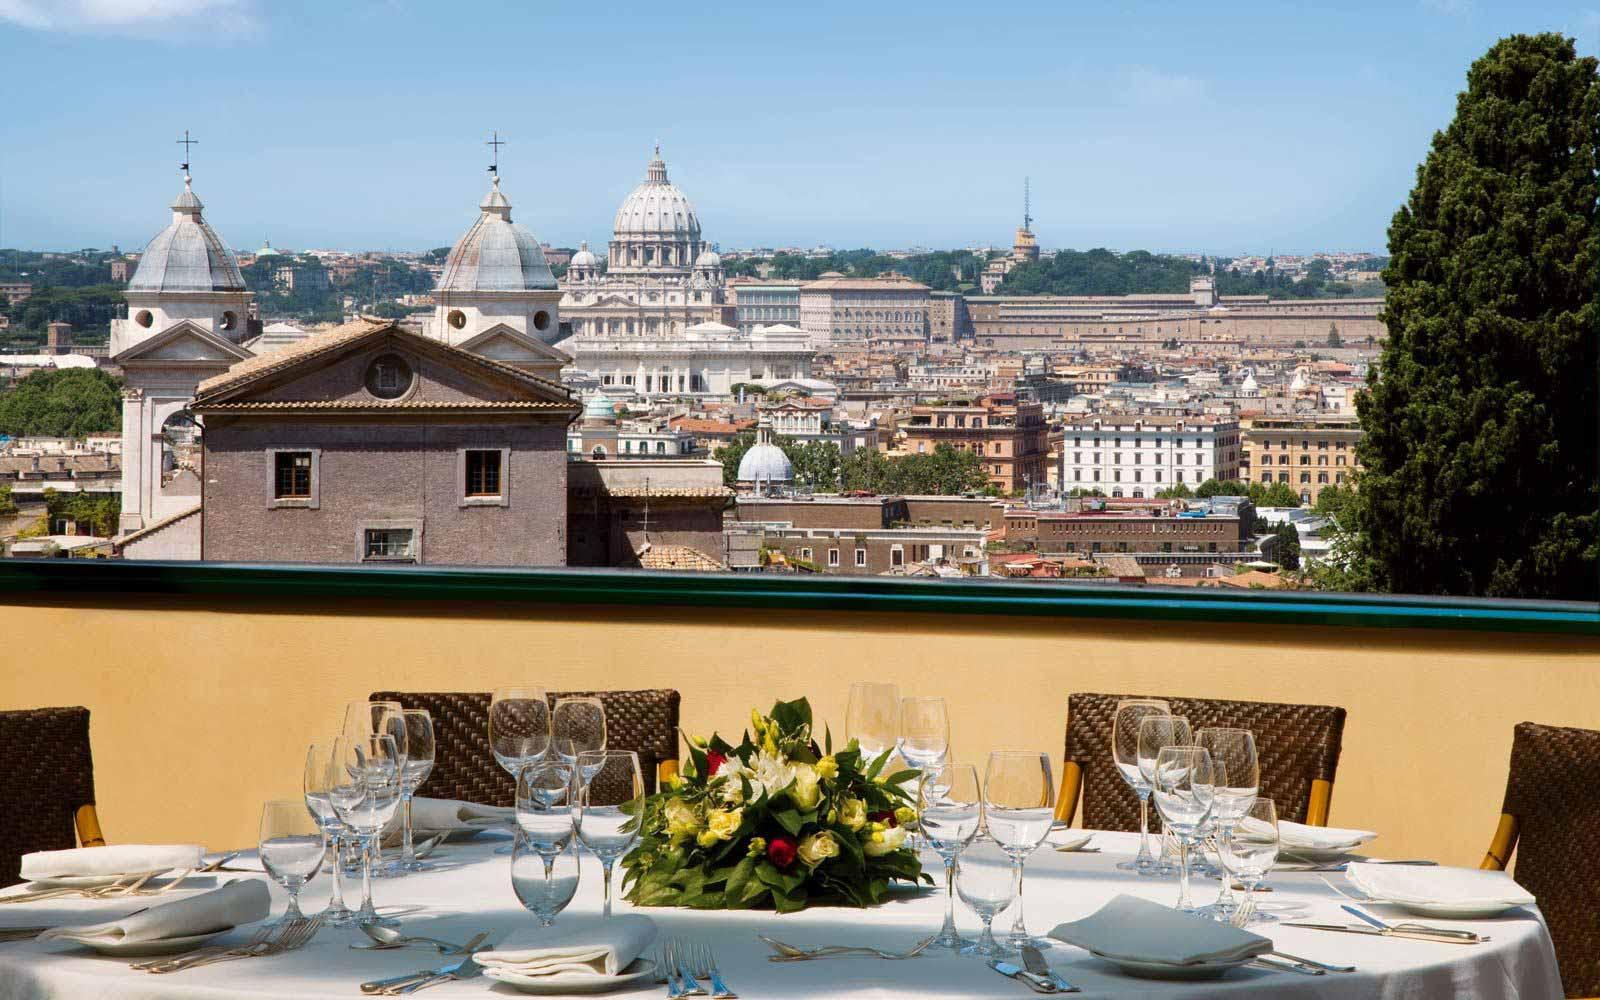 Hotel eden rome cities italy hotel eden package holidays - Hotel eden en roma ...